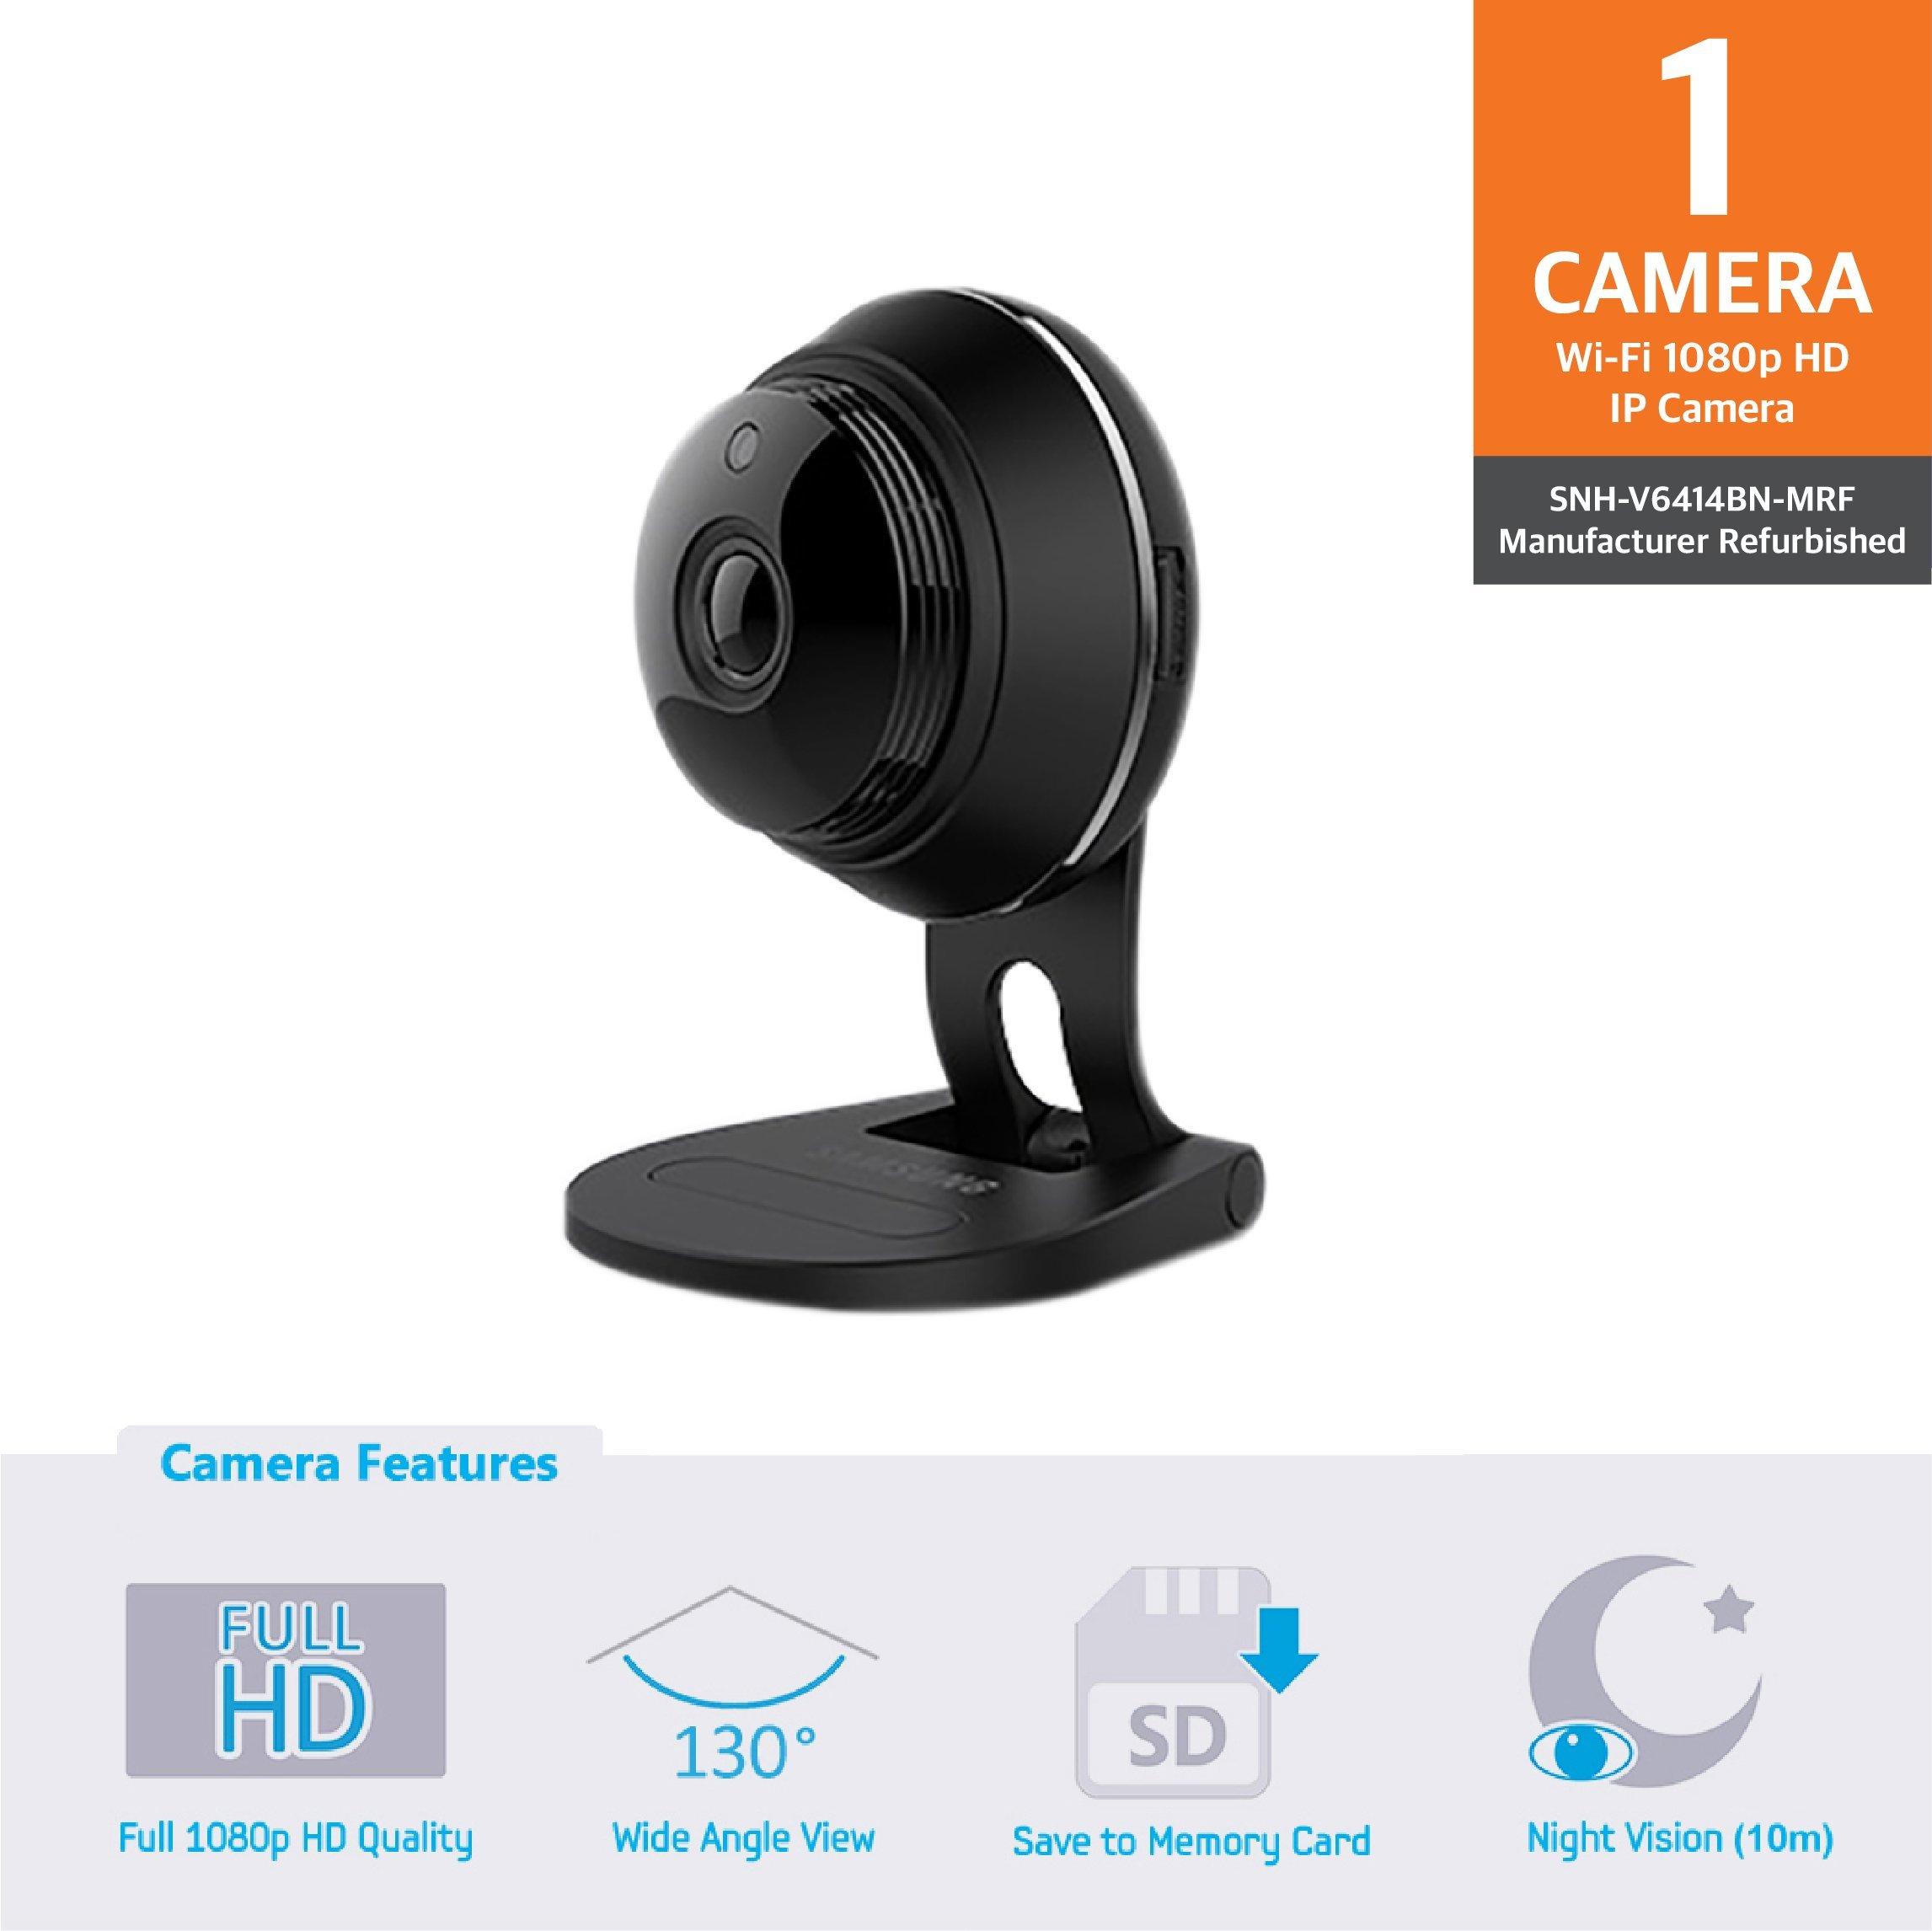 Samsung SNH-V6414BN SmartCam Full HD Plus 1080p WiFi IP Camera, Black (Certified Refurbished)